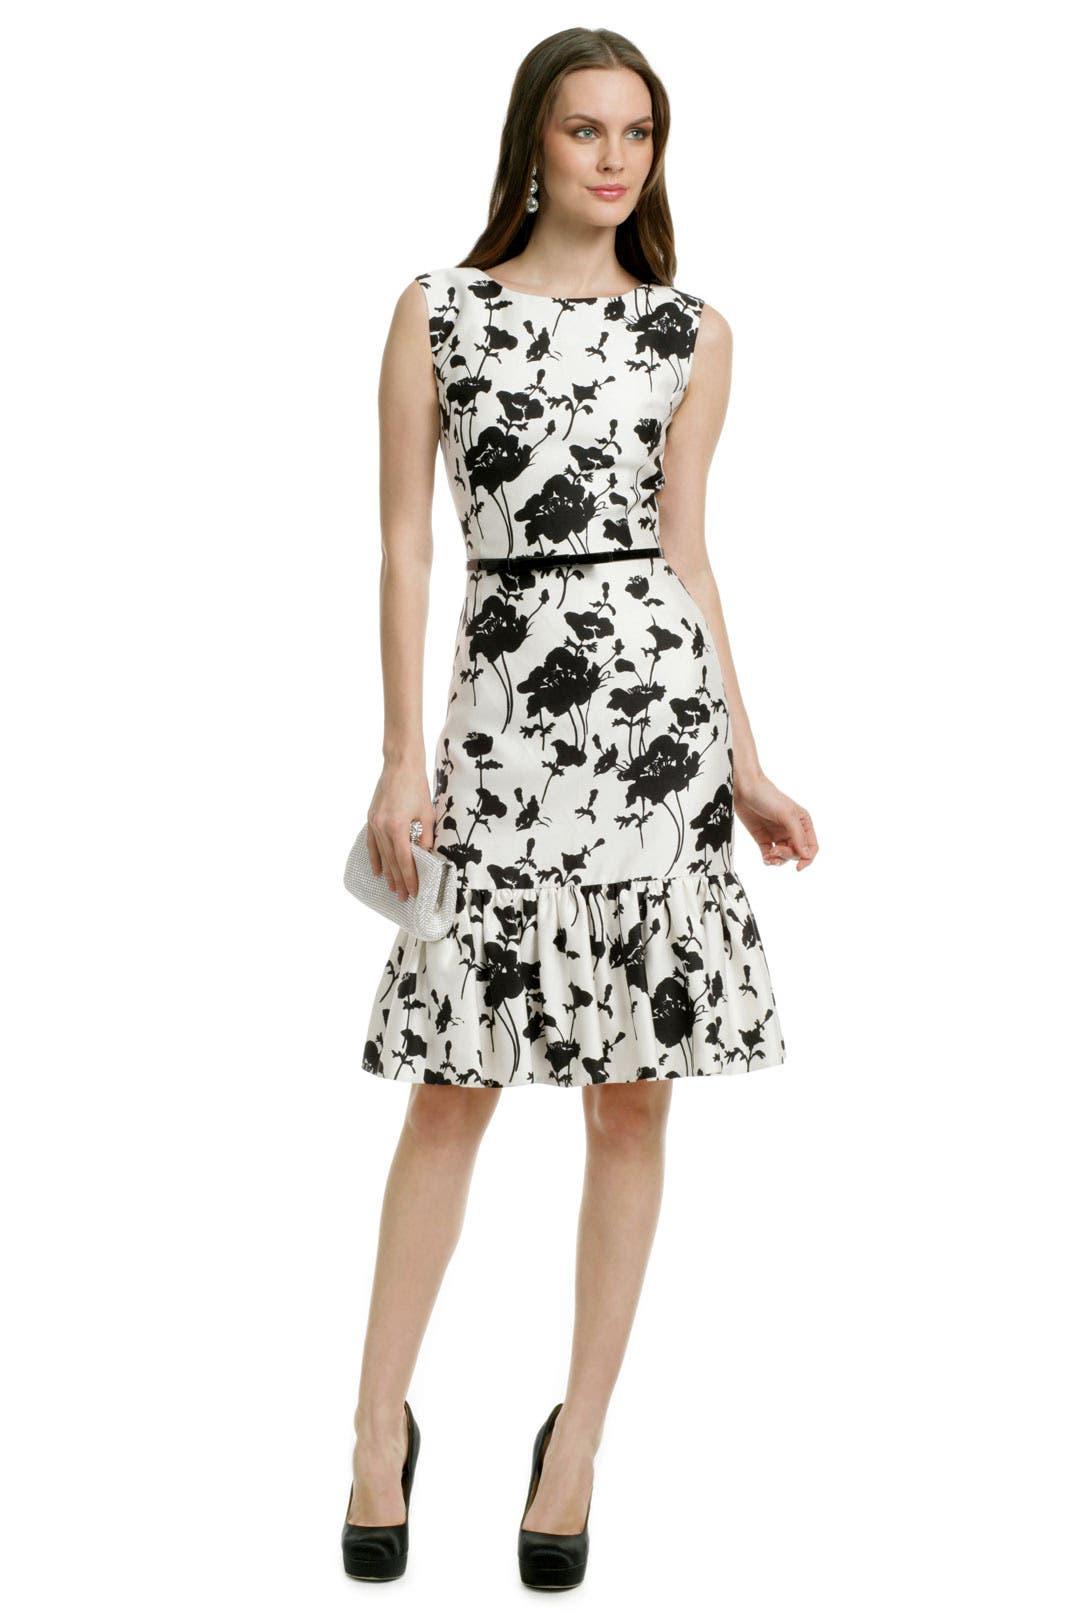 Boy Meets Girl Dress by kate spade new york